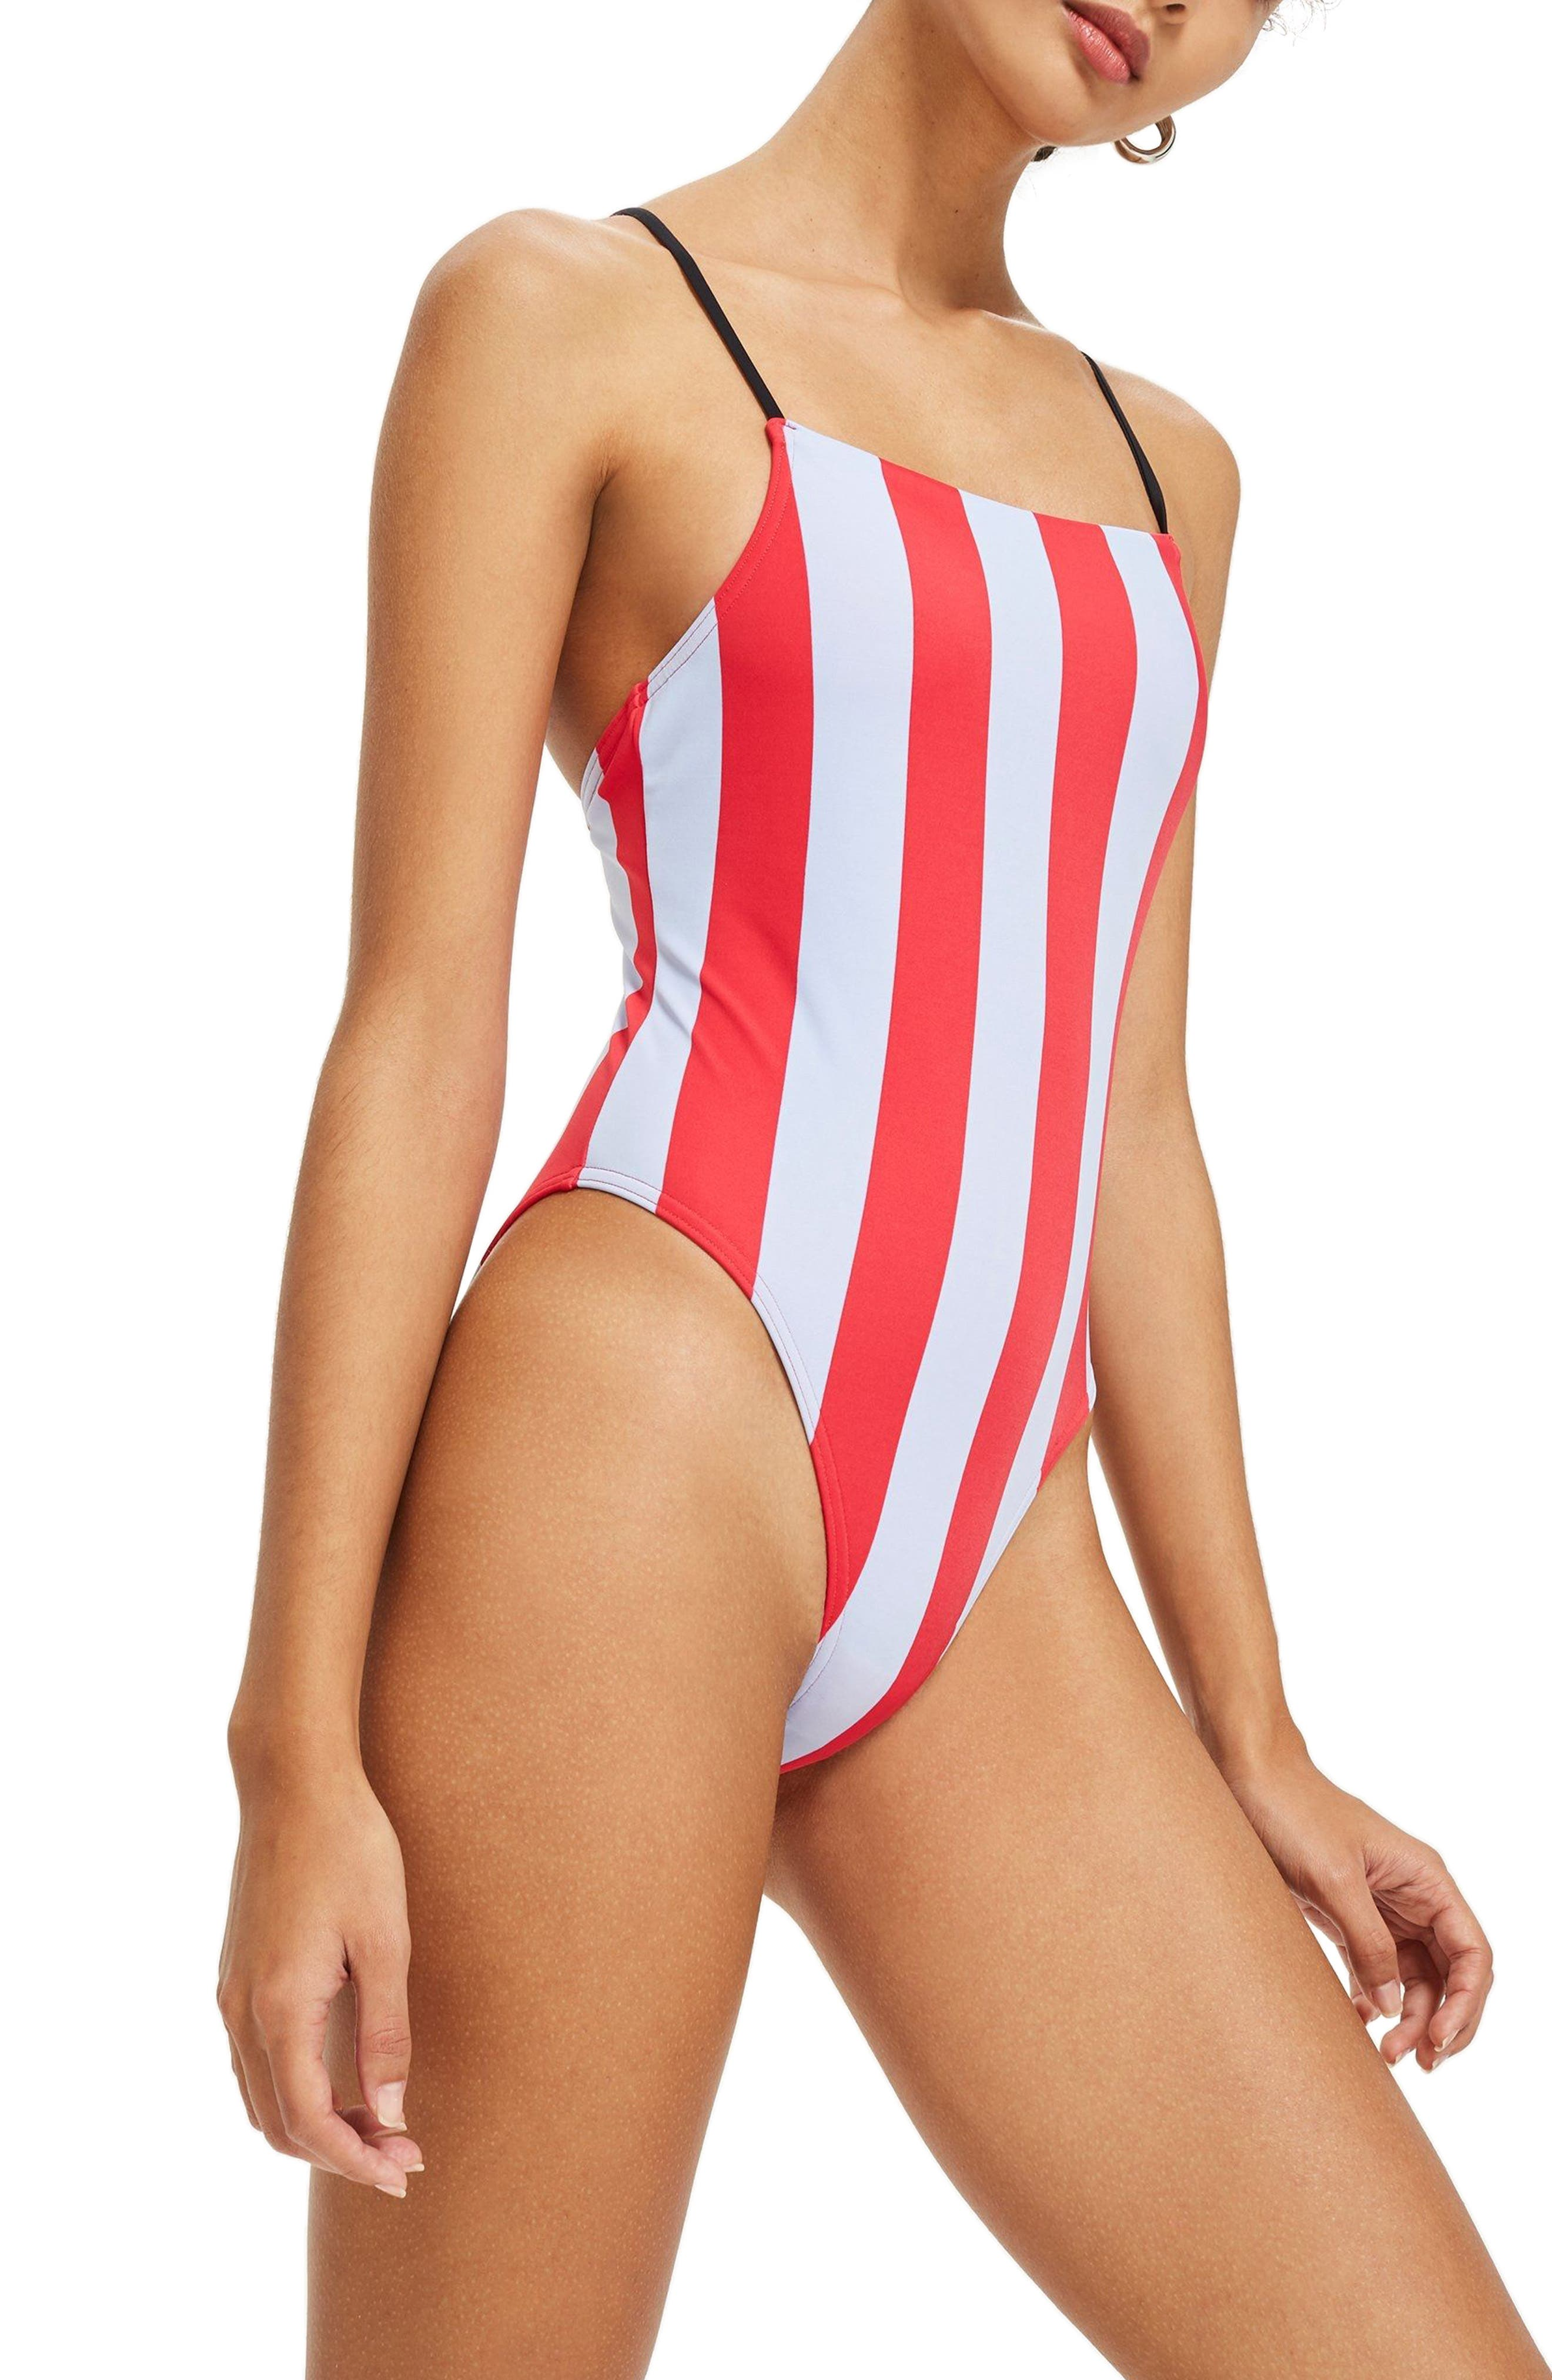 Topshop Stripe One-Piece Swimsuit